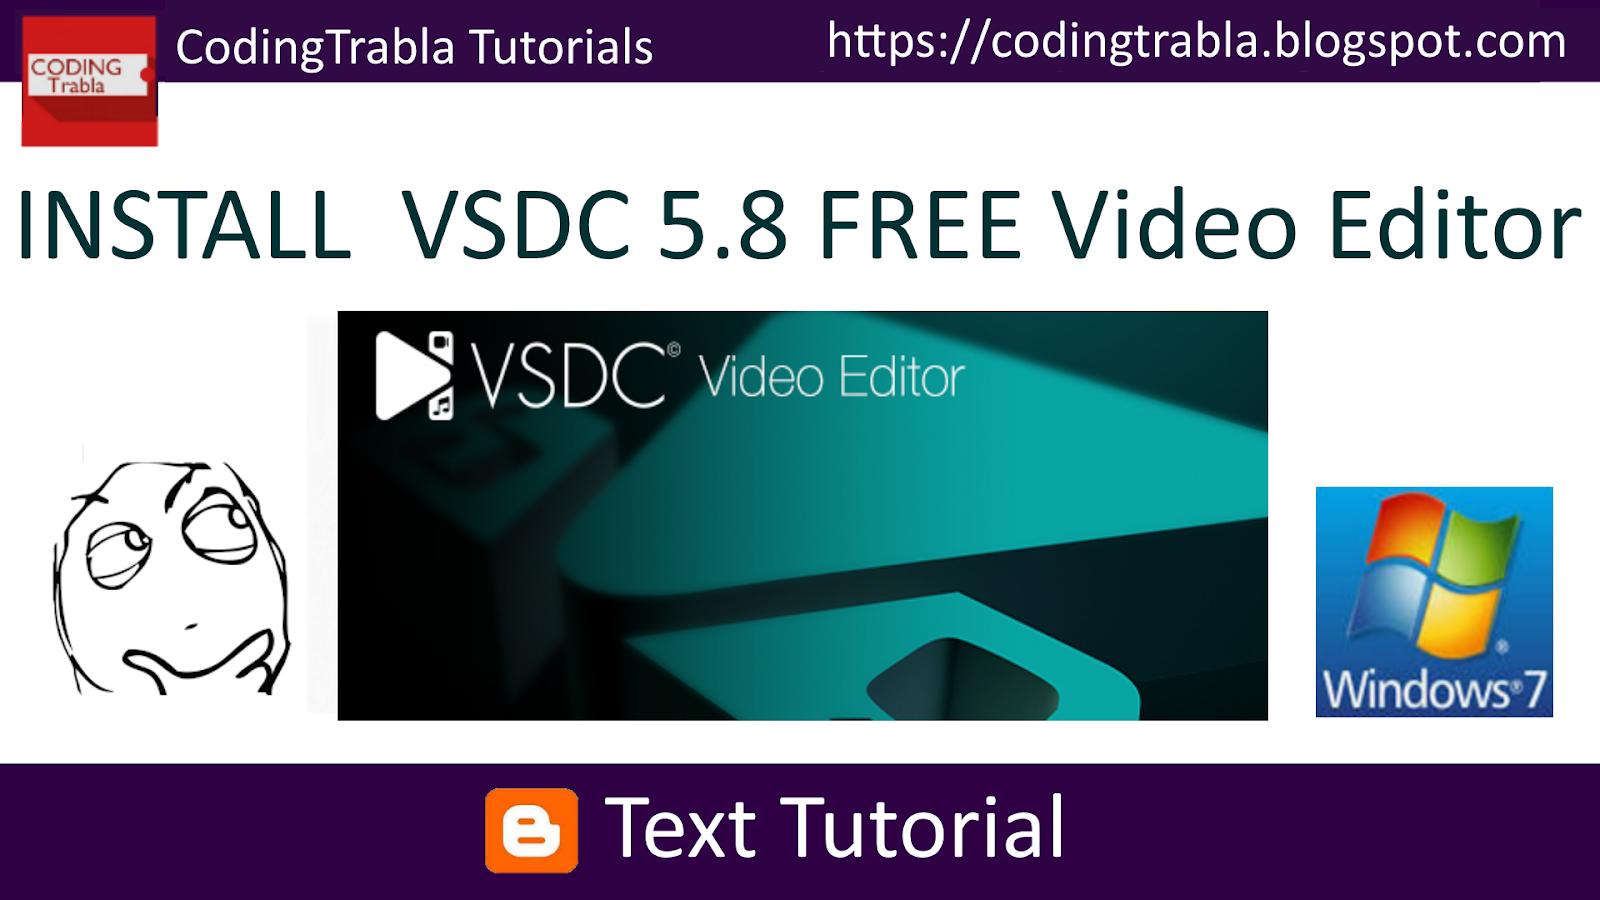 codingtrabla: Install VSDC 5 8 Free video editor on Windows